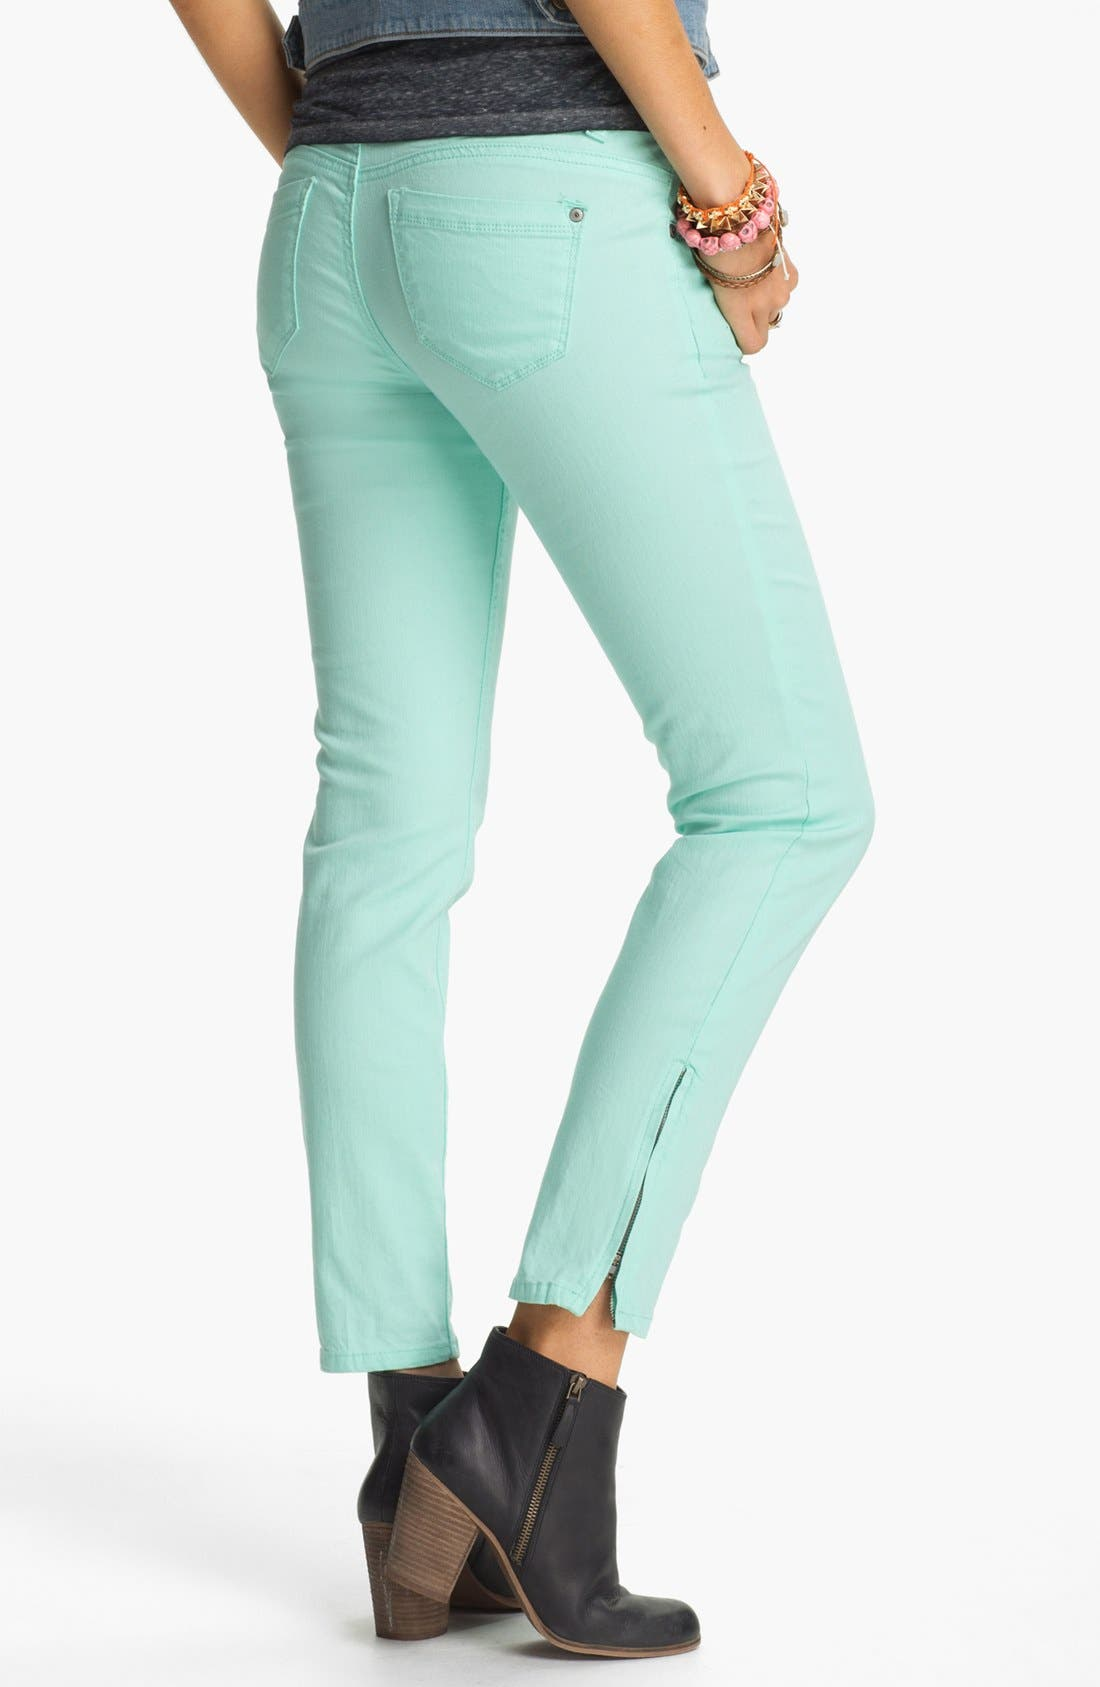 JOLT,                             Ankle Zip Skinny Jeans,                             Main thumbnail 1, color,                             337